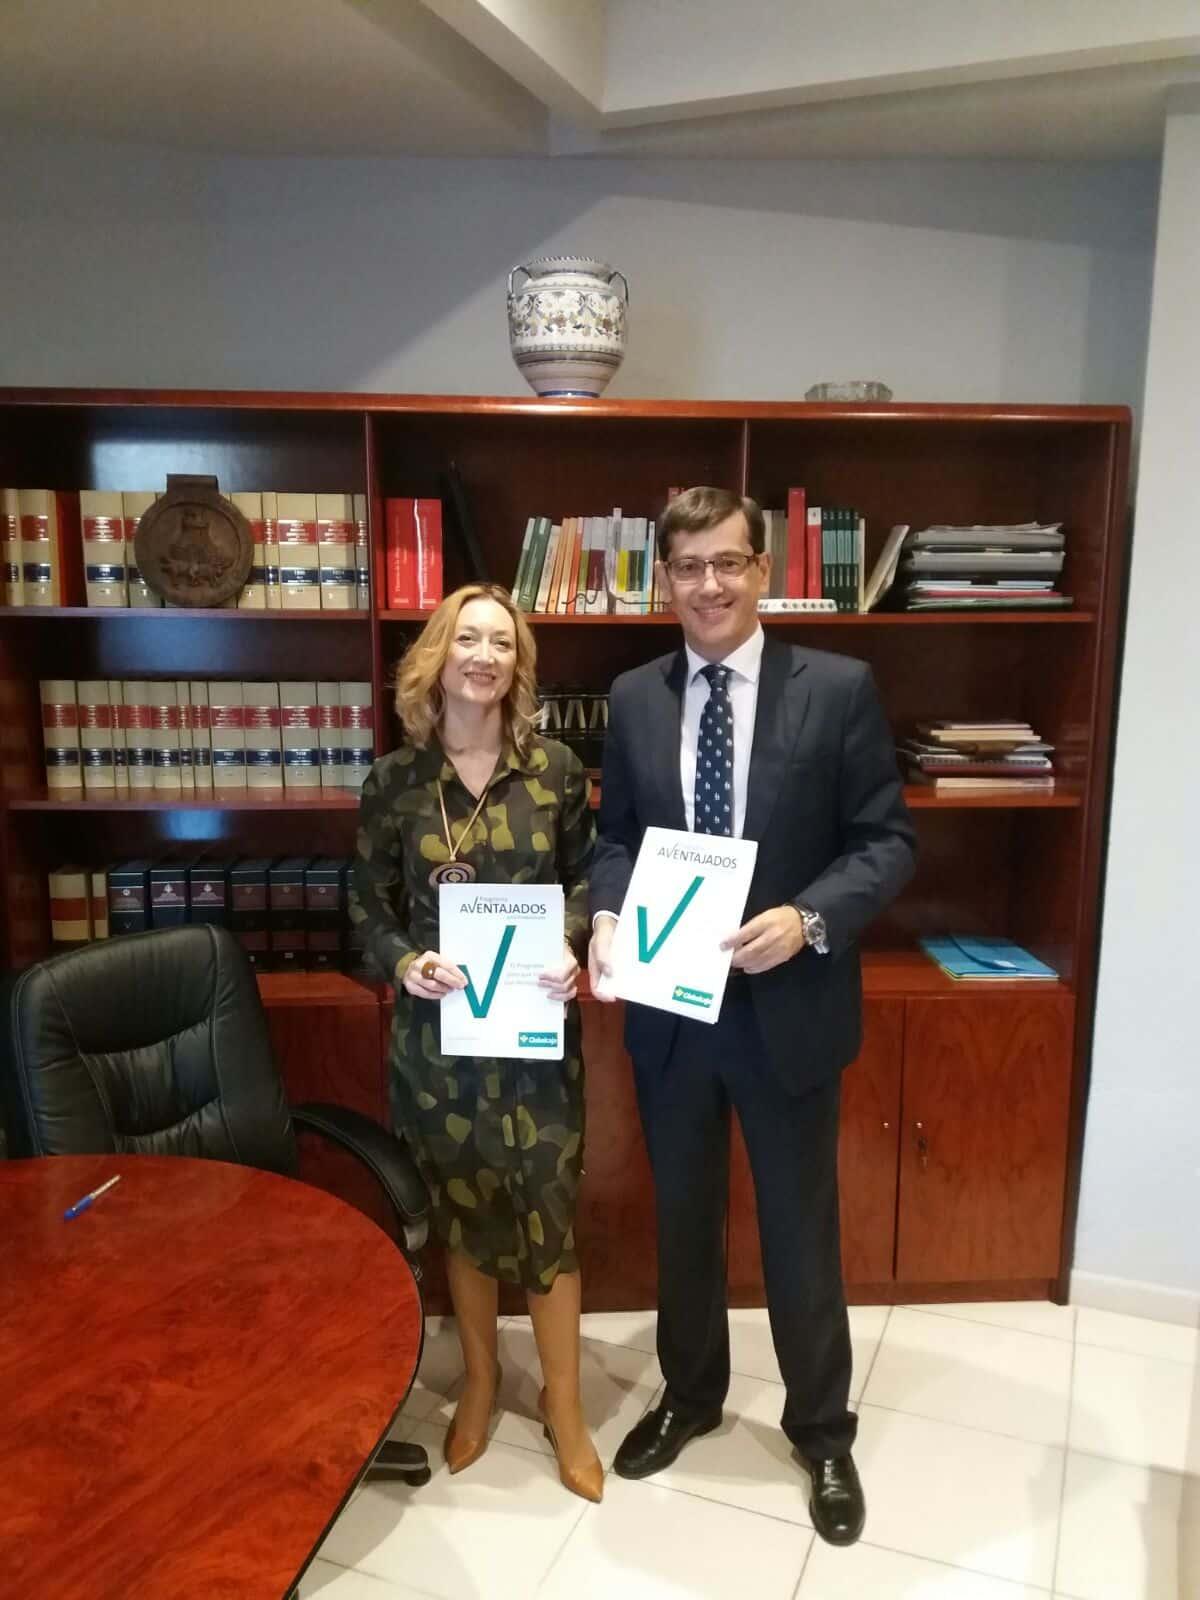 https://blog.globalcaja.es/wp-content/uploads/2017/10/Globalcaja-y-colegio-abogados-Talavera.jpg